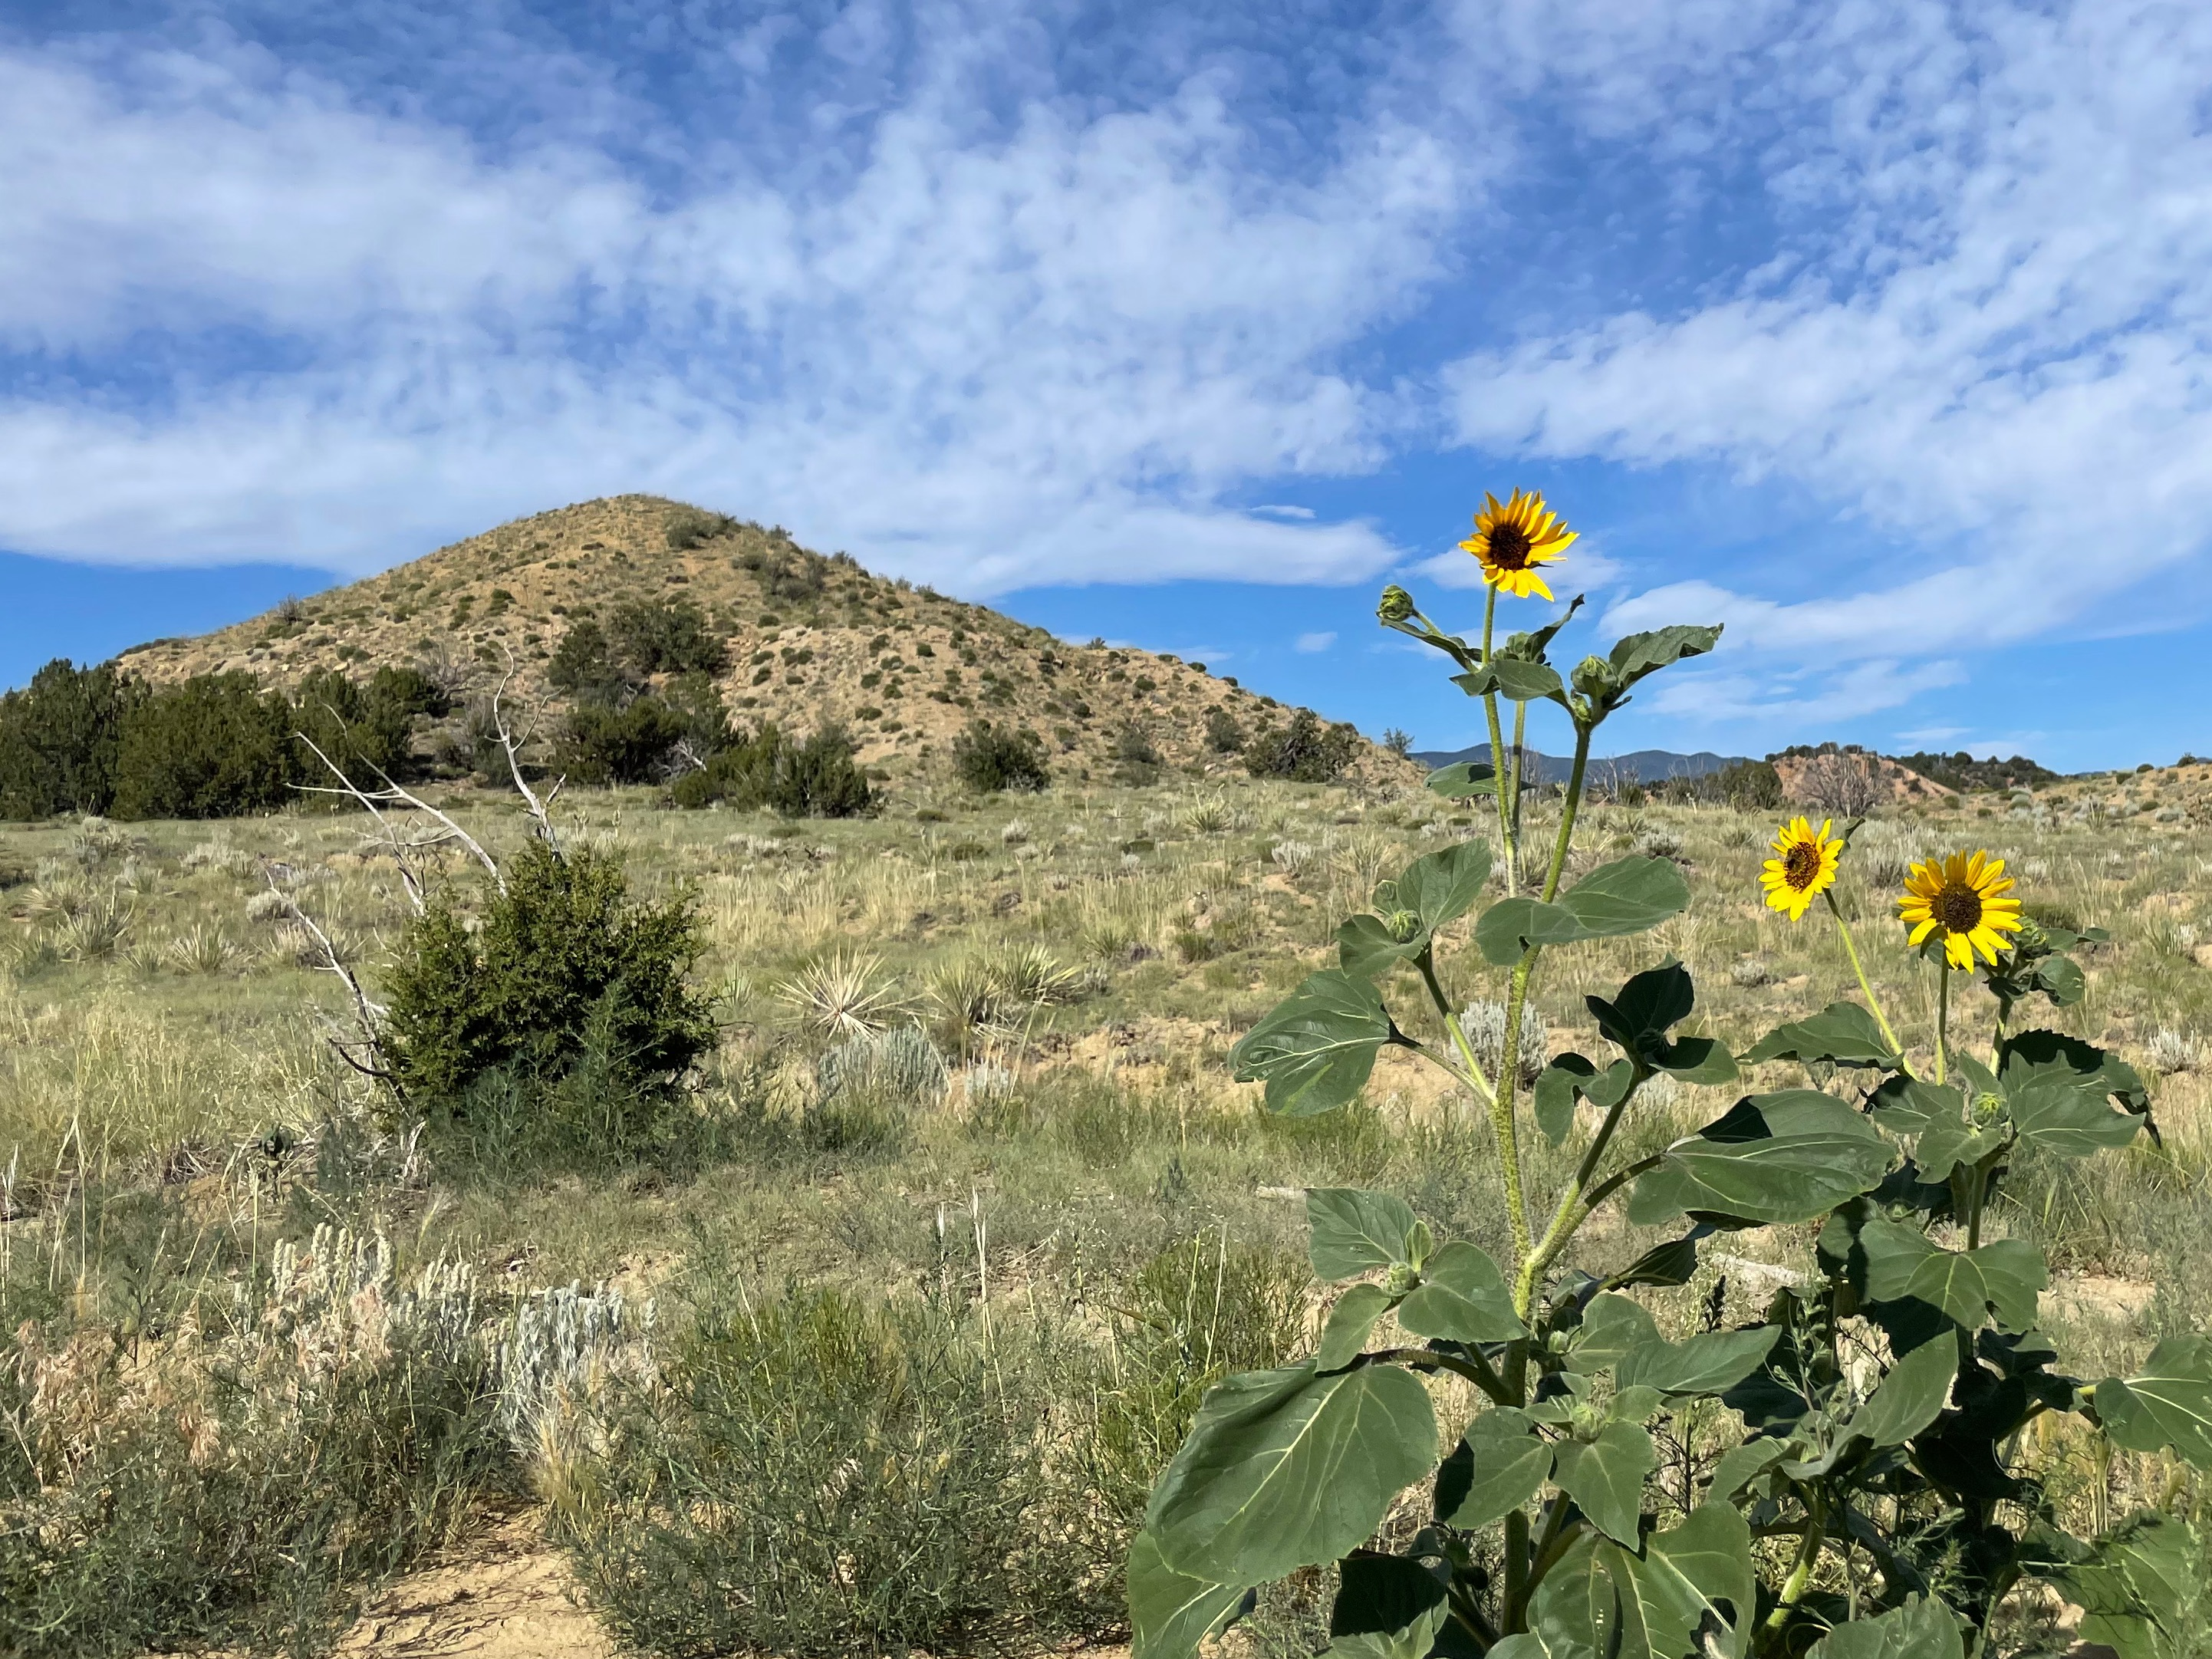 Sunflowers grow under blue sky and mountain views